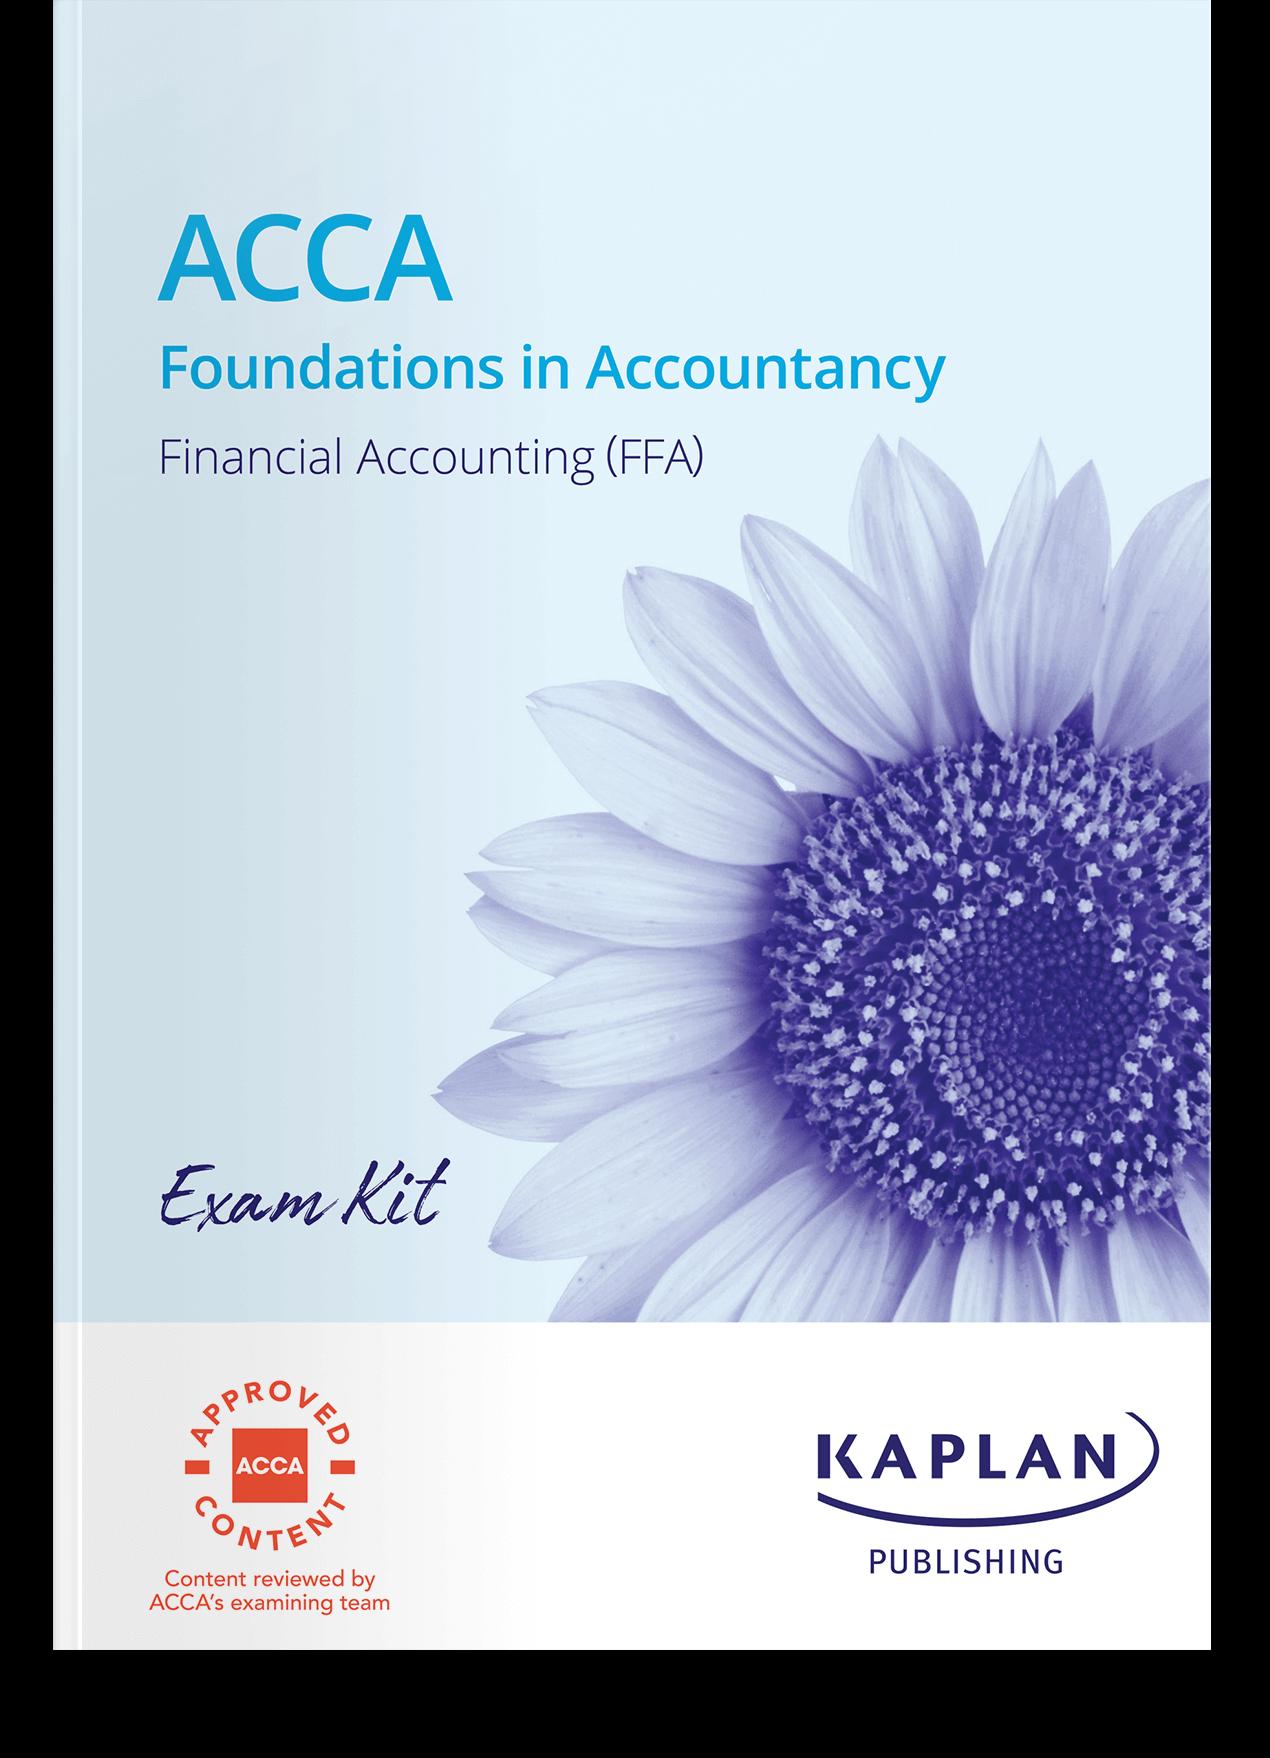 ACCA Financial Accounting (FFA) Exam Kit